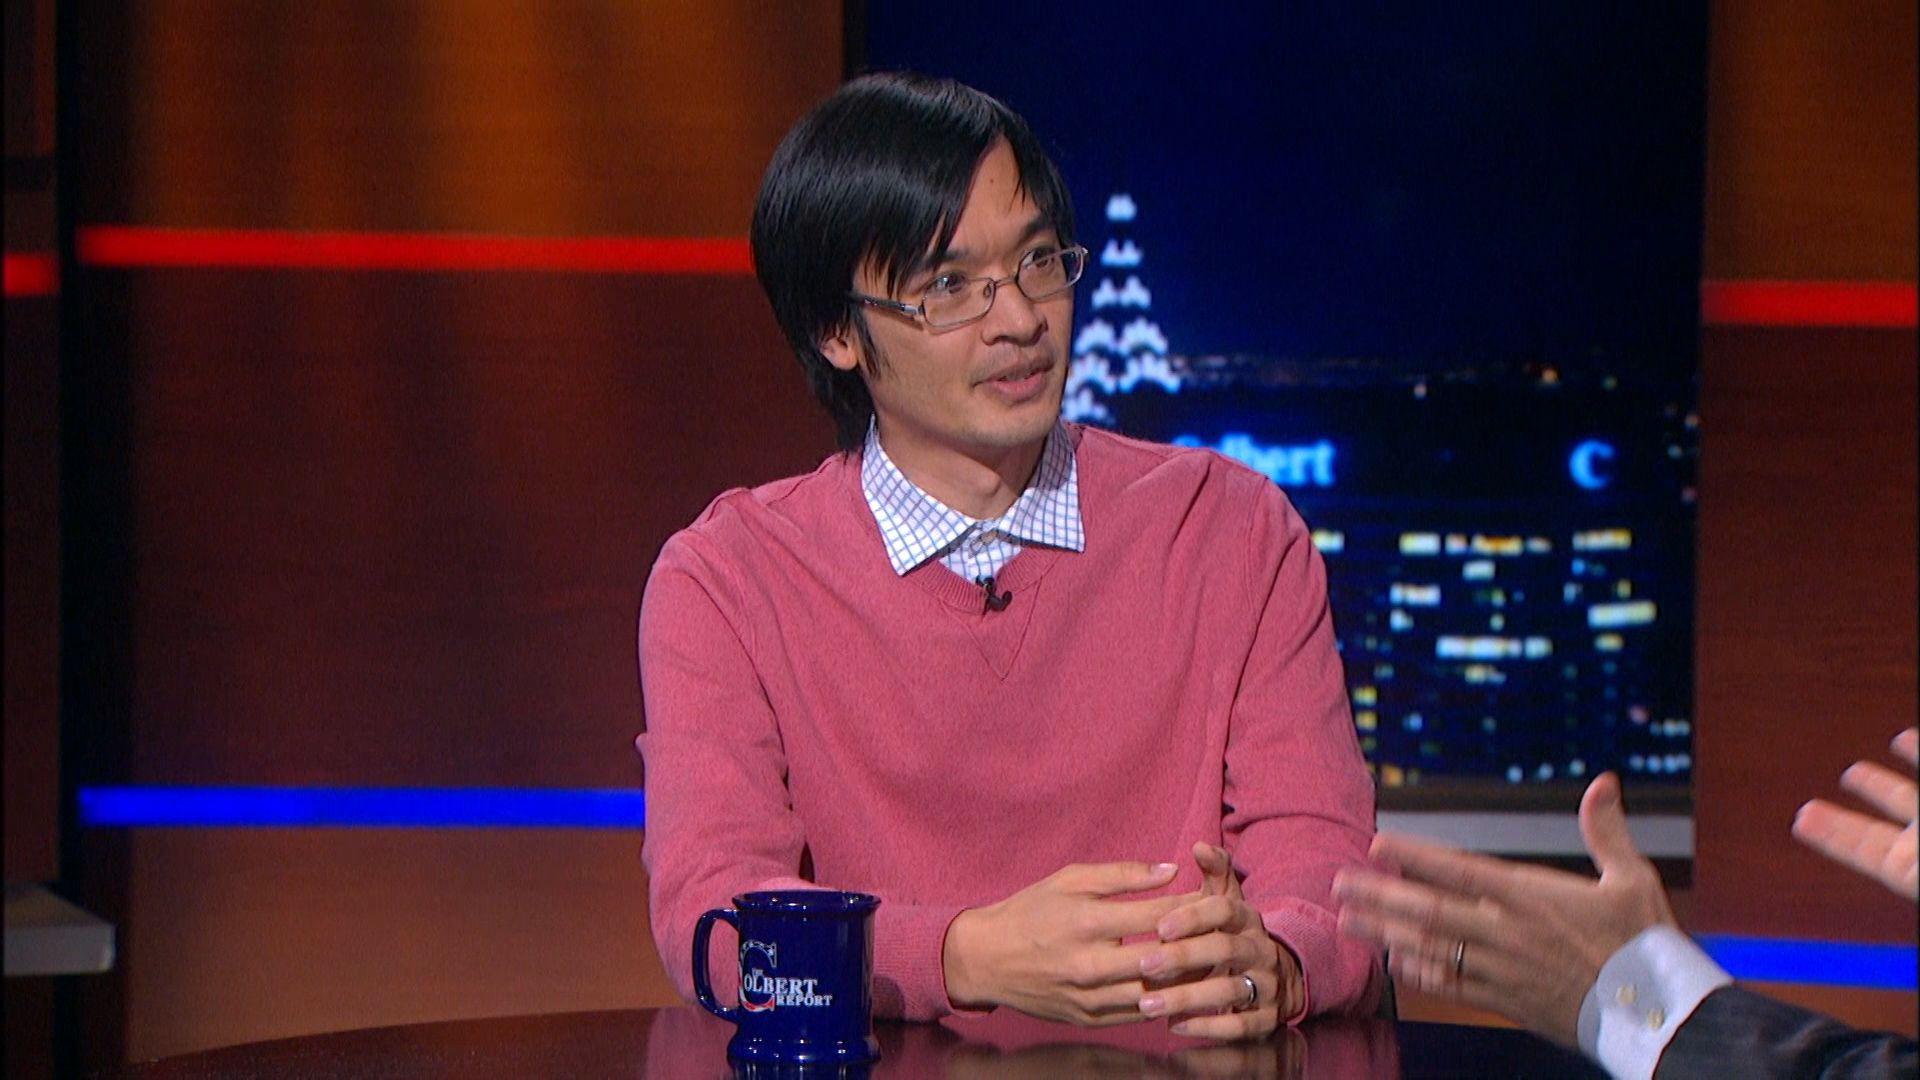 Terence Tao - Terence Tao - The Colbert Report - Video ...